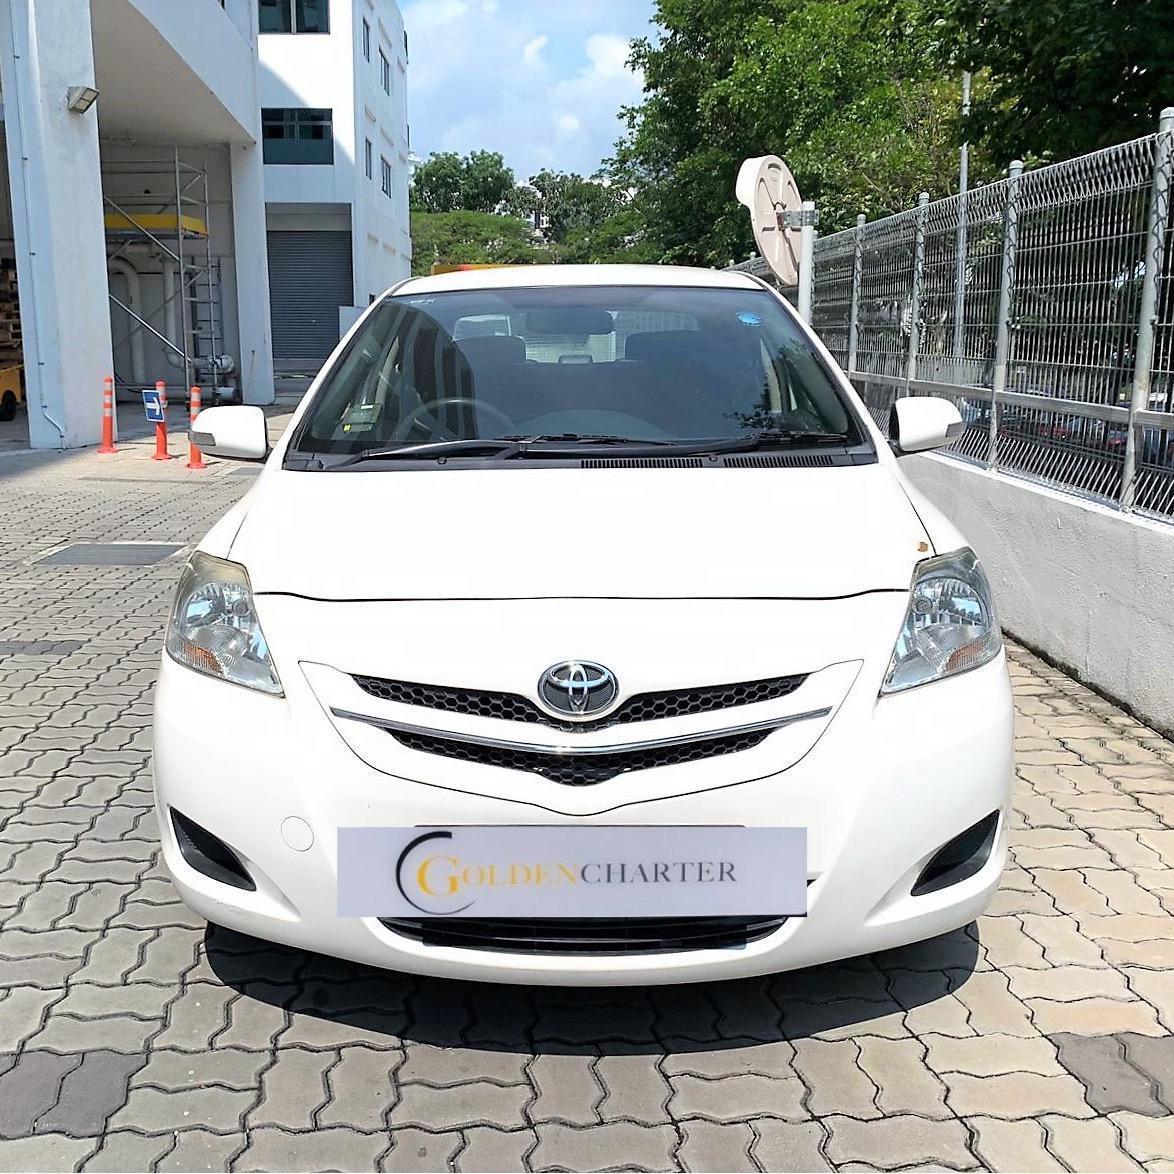 Toyota Vios For Rent , Go-Jek Rebate. Grab/Go-Jek/Ryde/TADA. All PHV/Personal usage available! Cheap Rental, Long/Short Term Rental. Honda Jazz/Fit/Stream/Freed   Toyota Vios/Altis/Camry/Wish/Sienta/Estima   Avante   Mazda2 & 3  